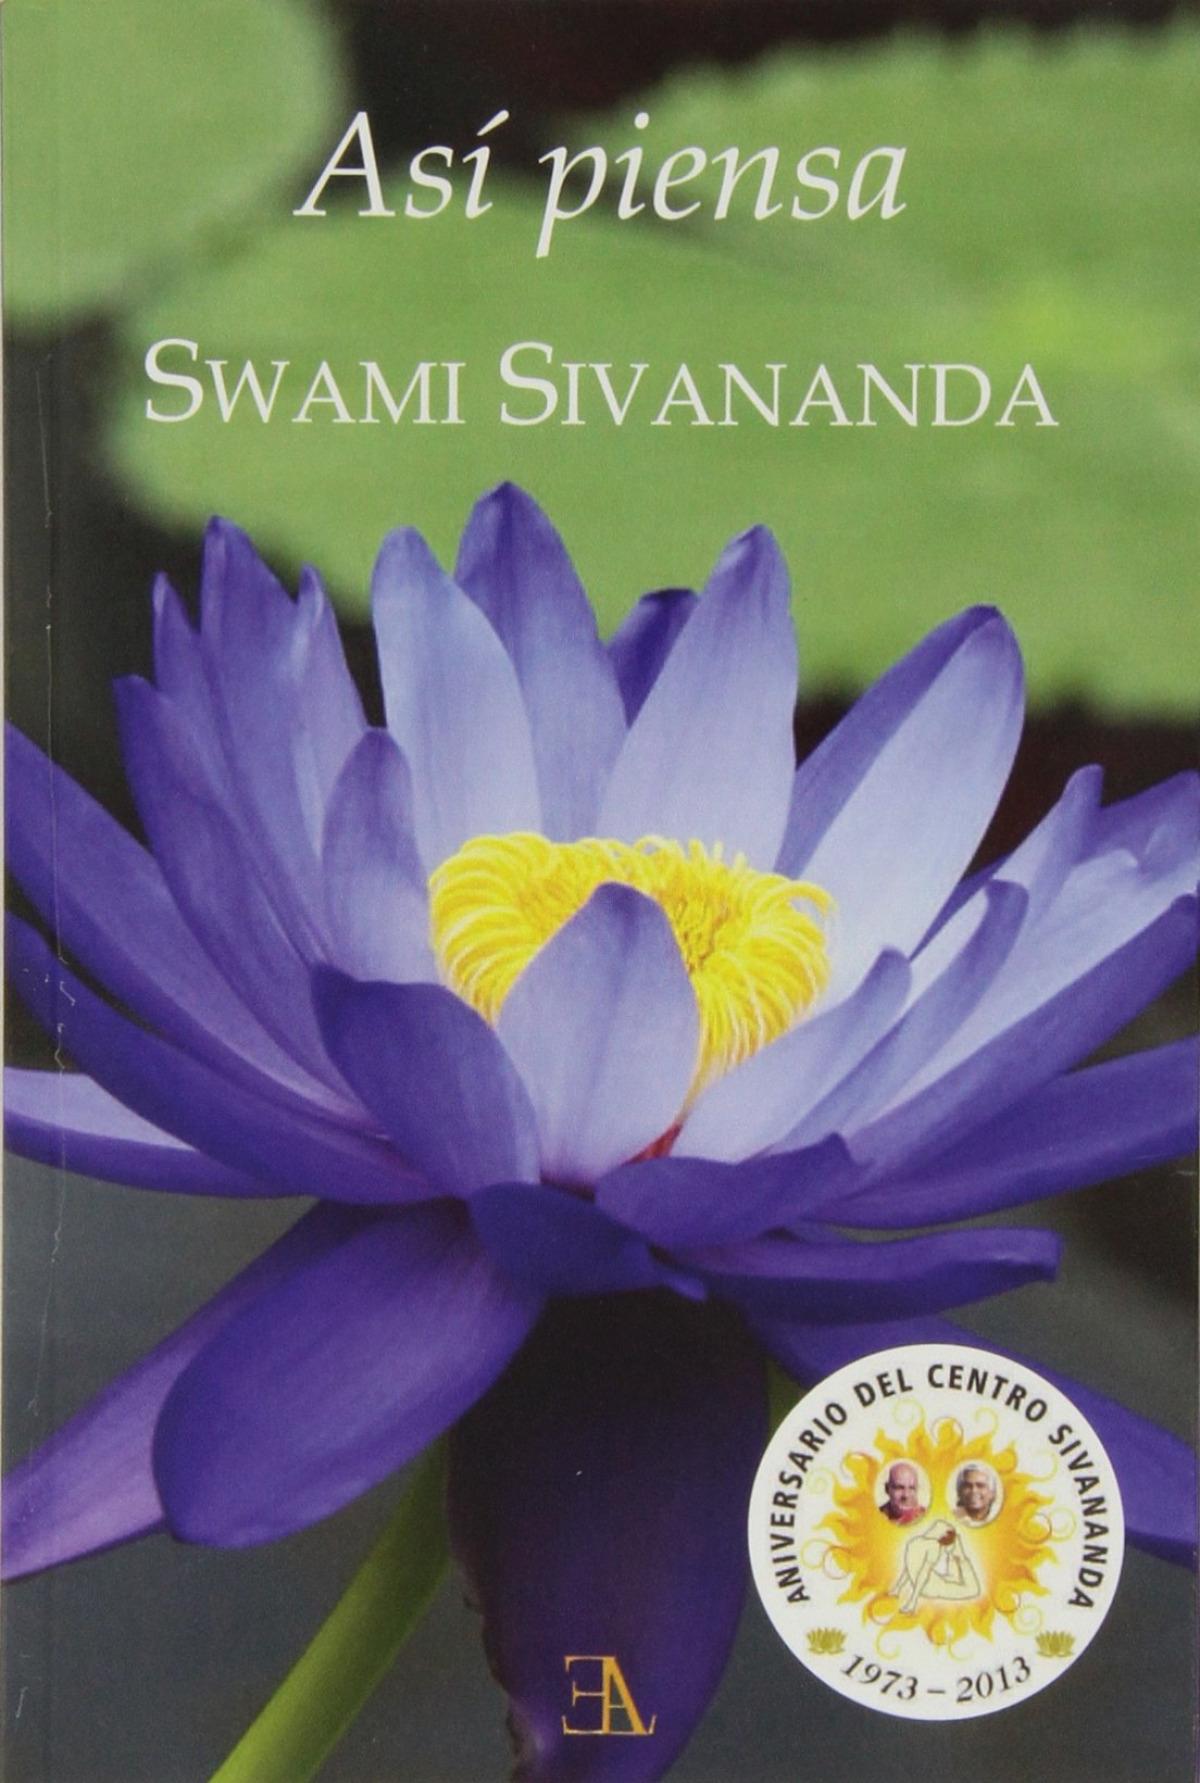 Así piensa Swami Sivananda